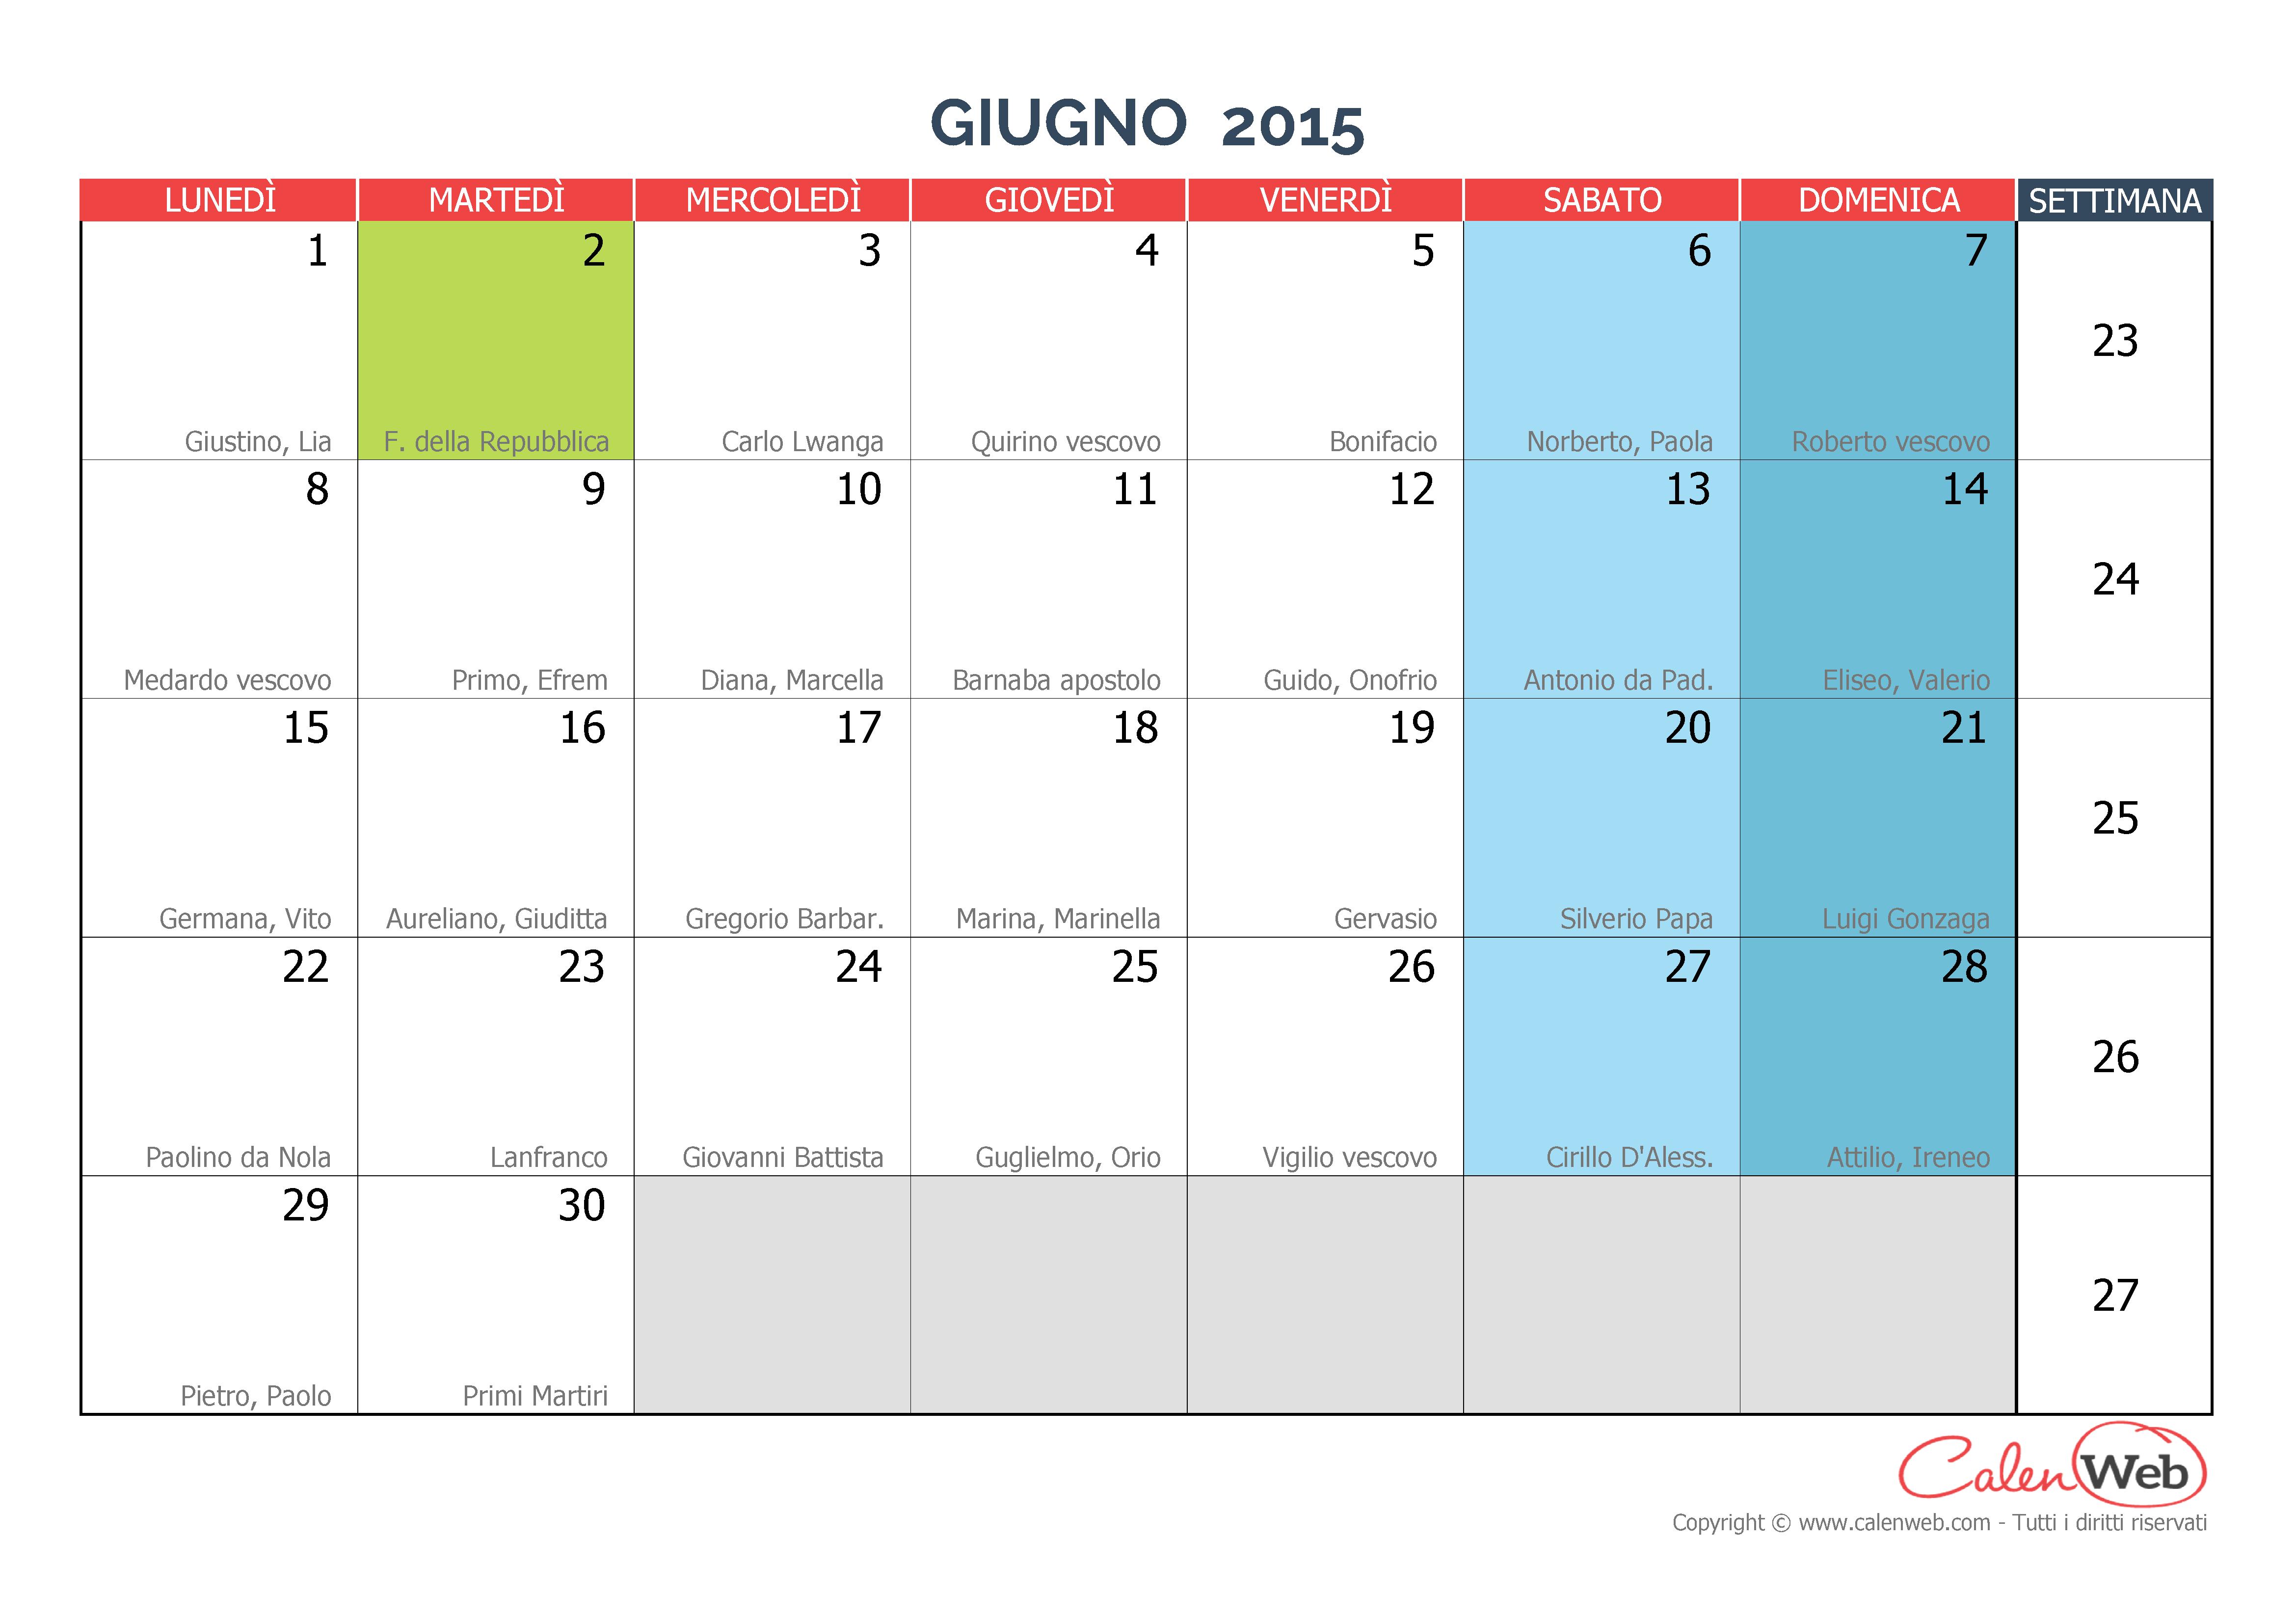 Calendario Mese Giugno.Calendario Mensile Mese Di Giugno 2015 Con Le Festivita